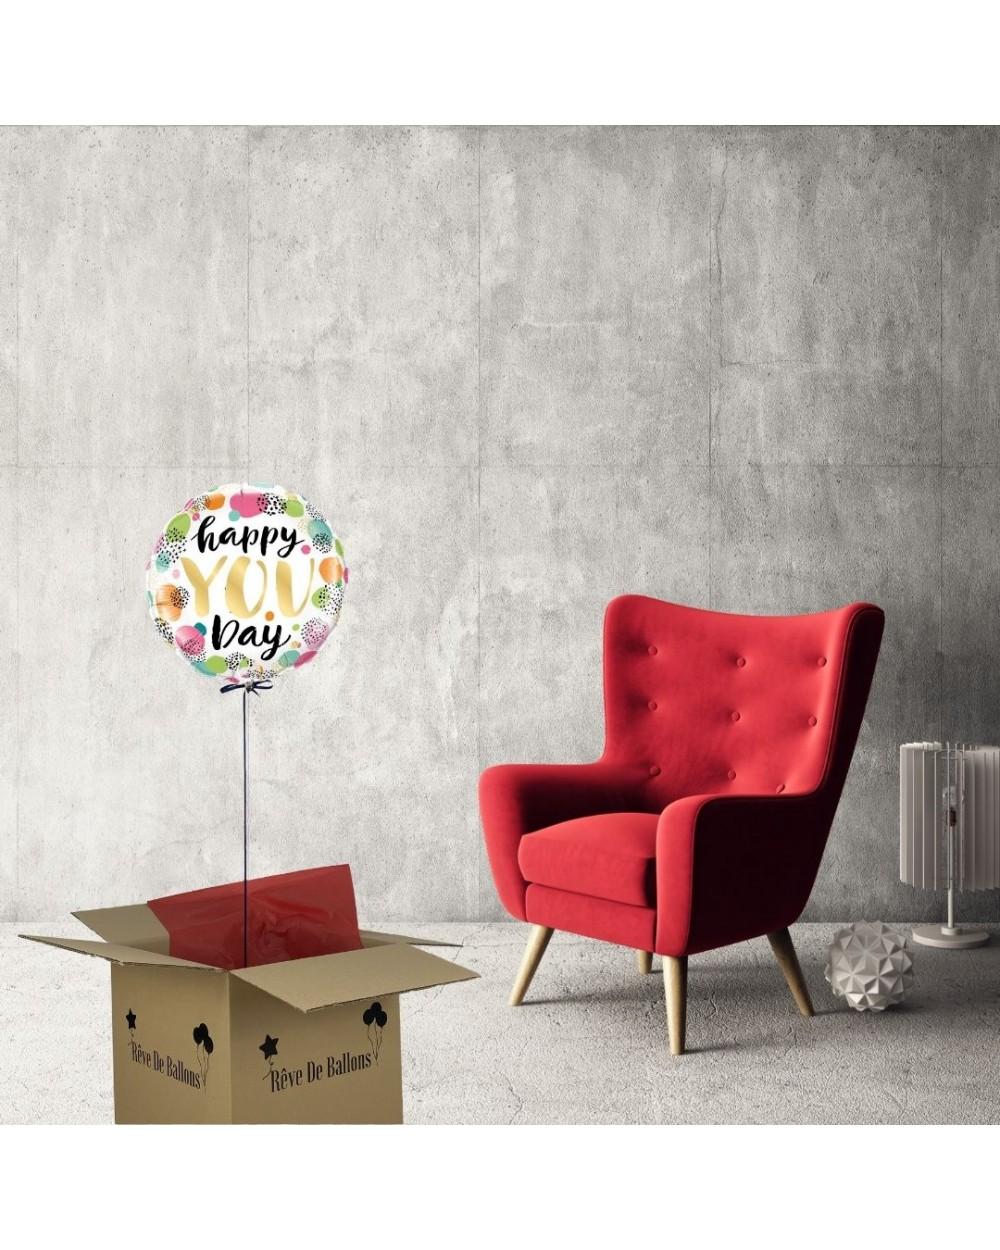 ballon cadeau anniversaire happy you day